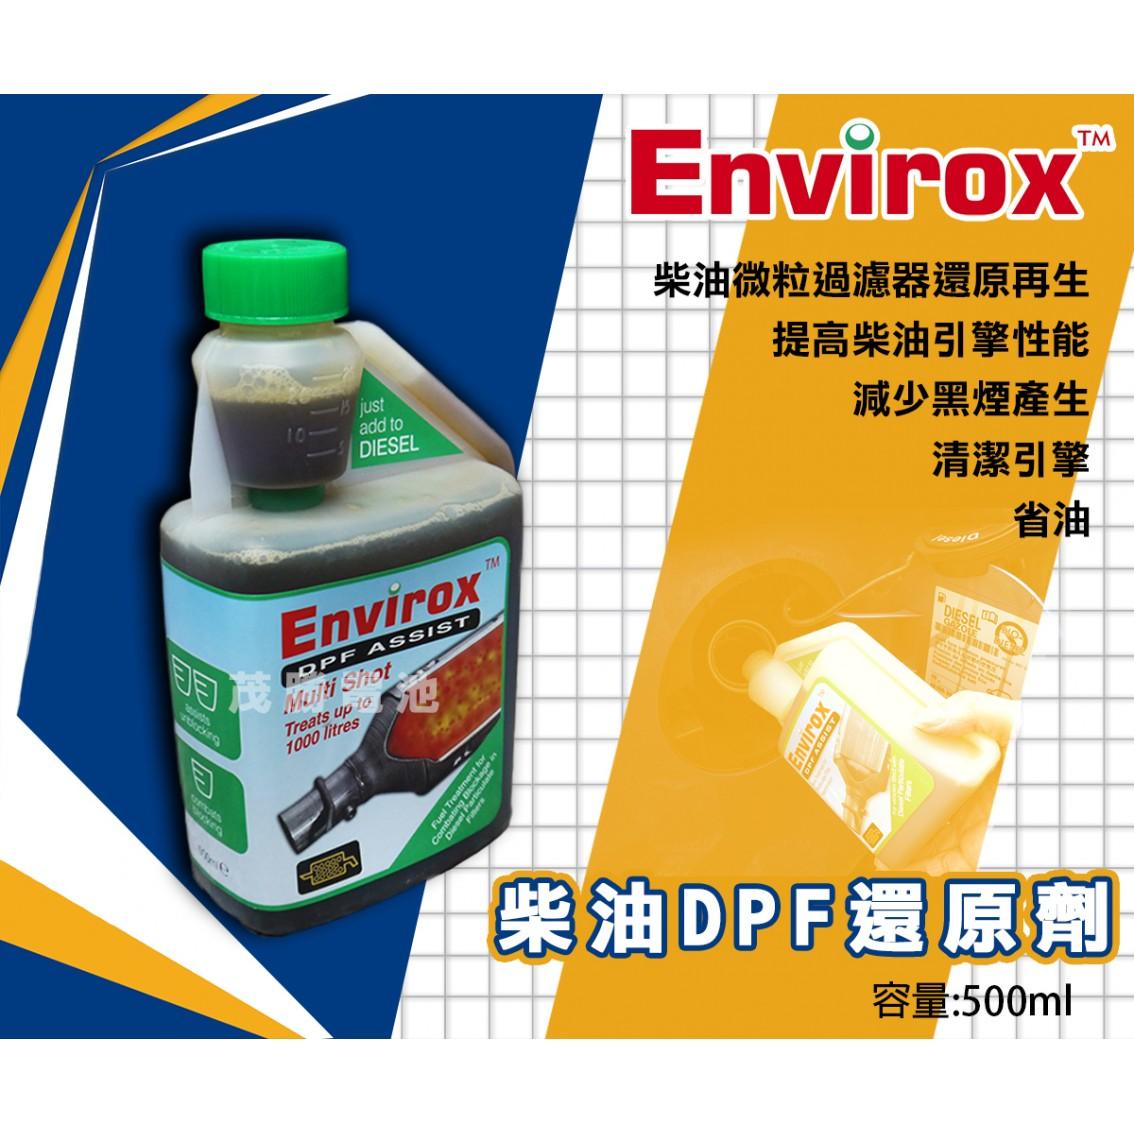 Envirox 柴油DPF還原劑 500ML